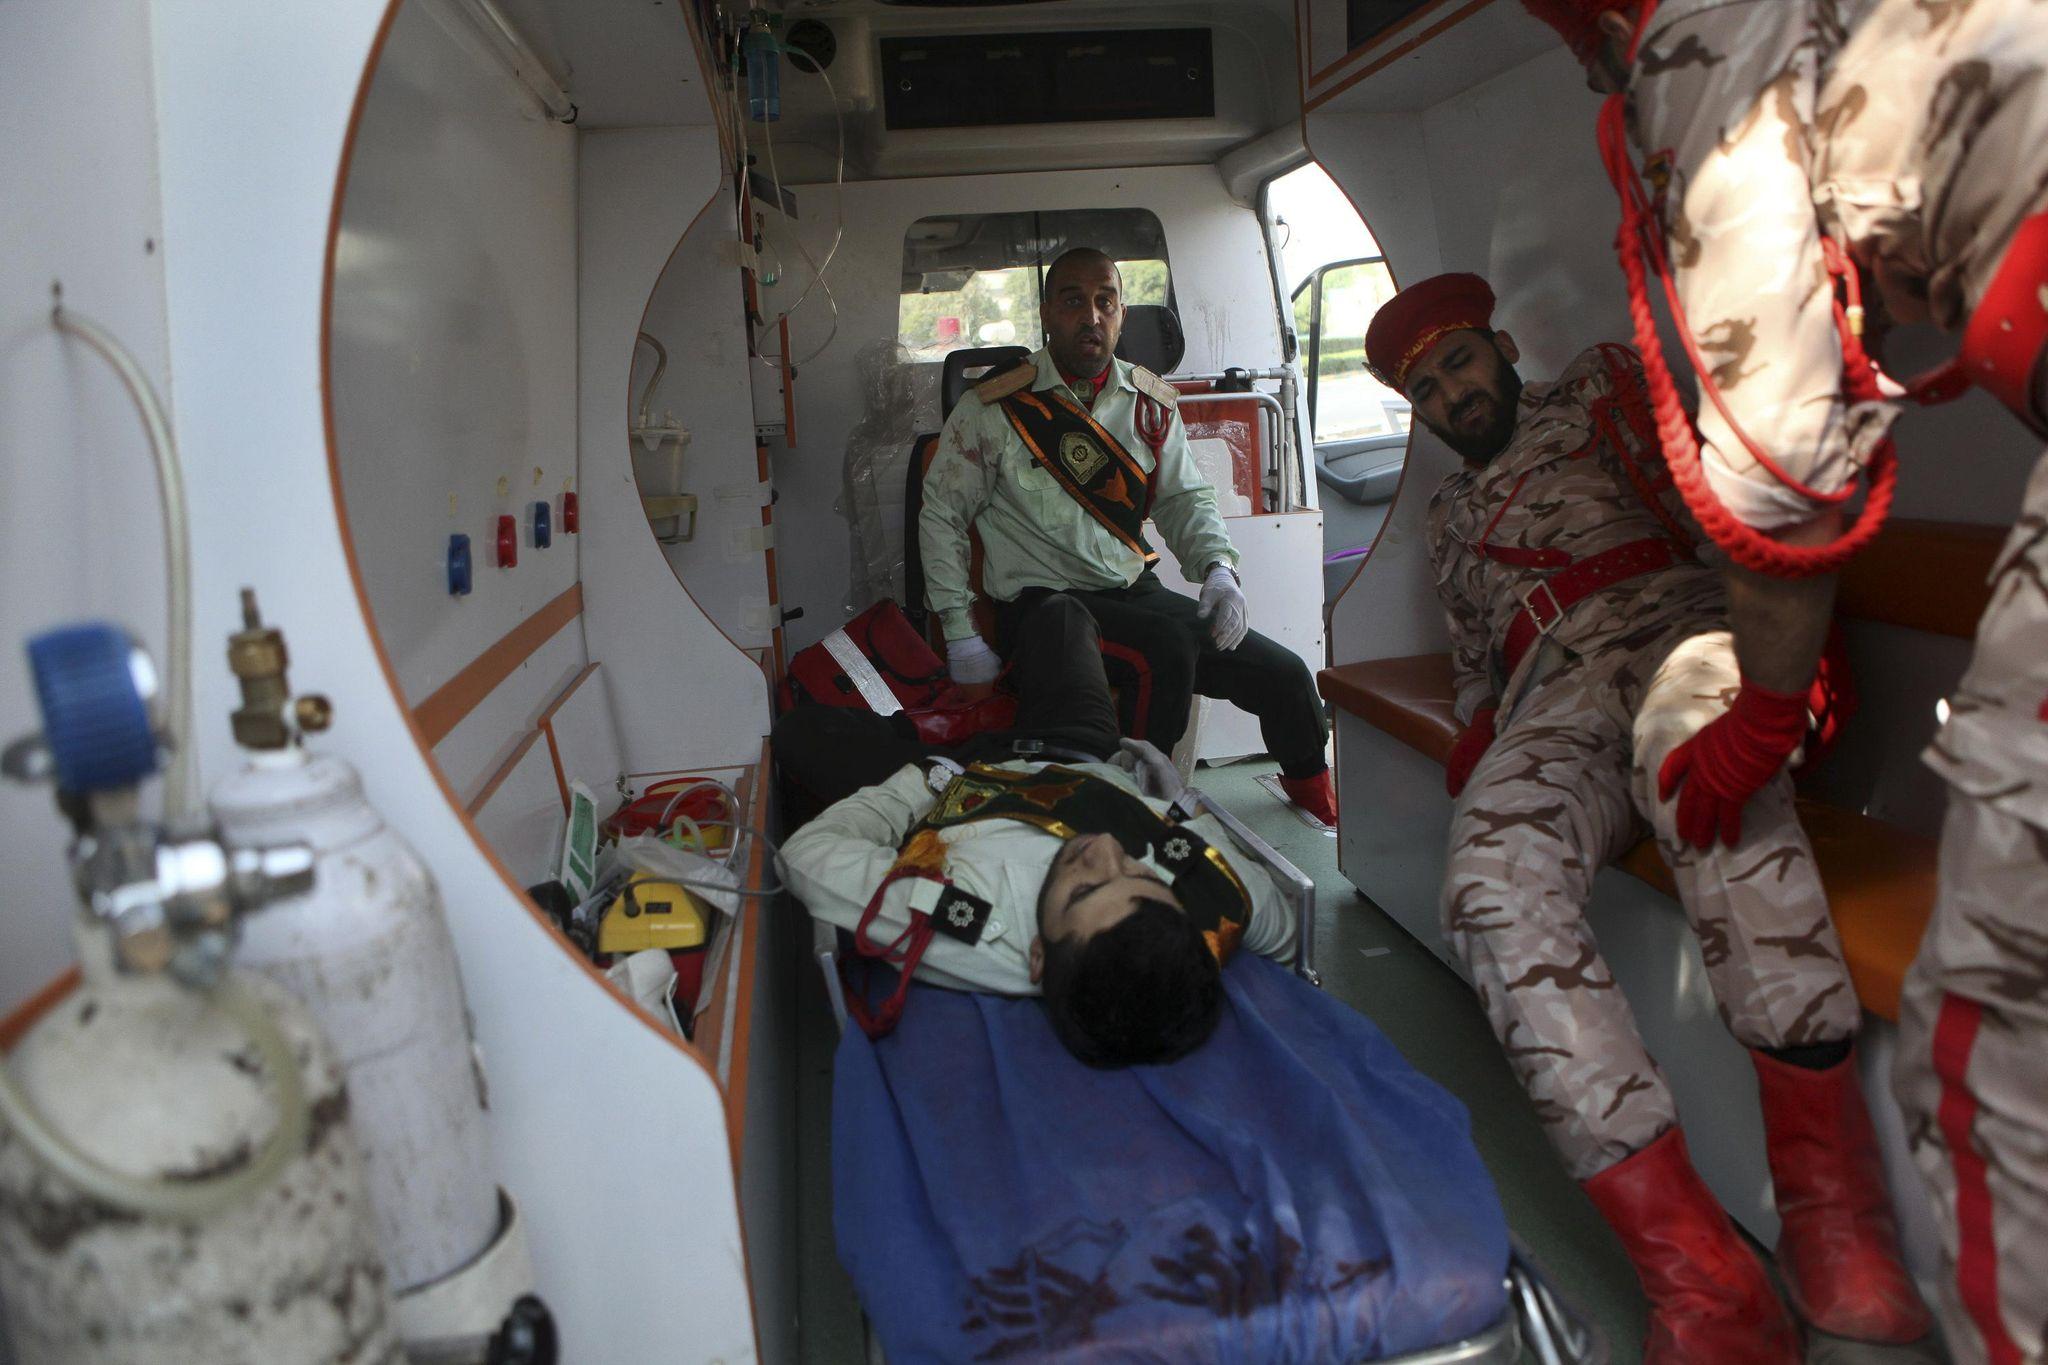 The Latest: Iran says US ally behind military parade attack - Washington Times